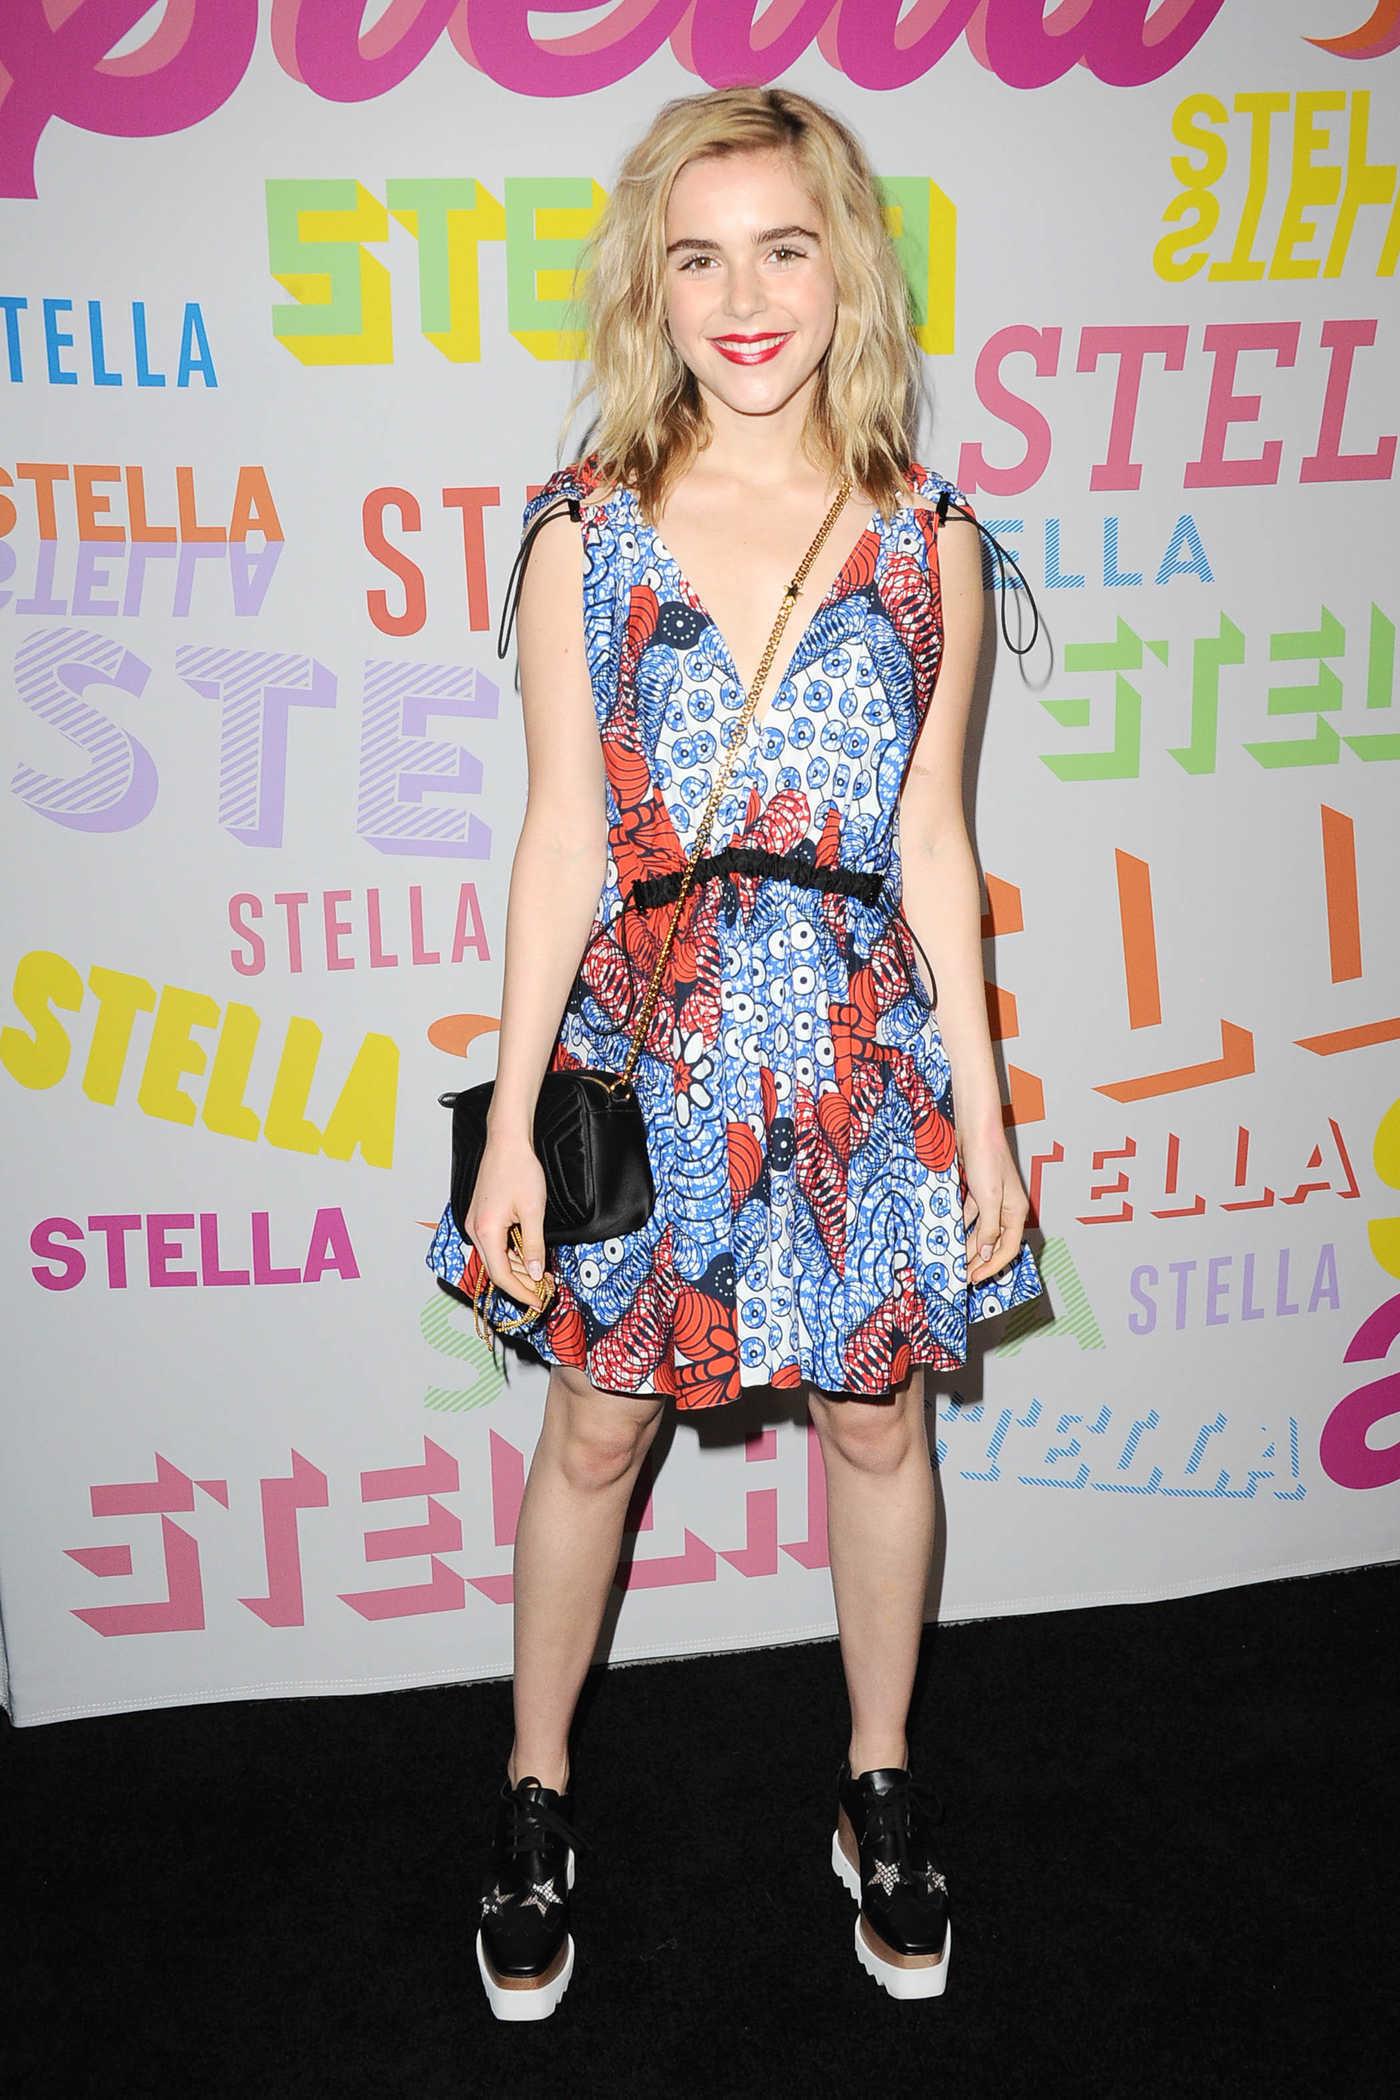 Kiernan Shipka at the Stella McCartney Show in Hollywood 01/16/2018